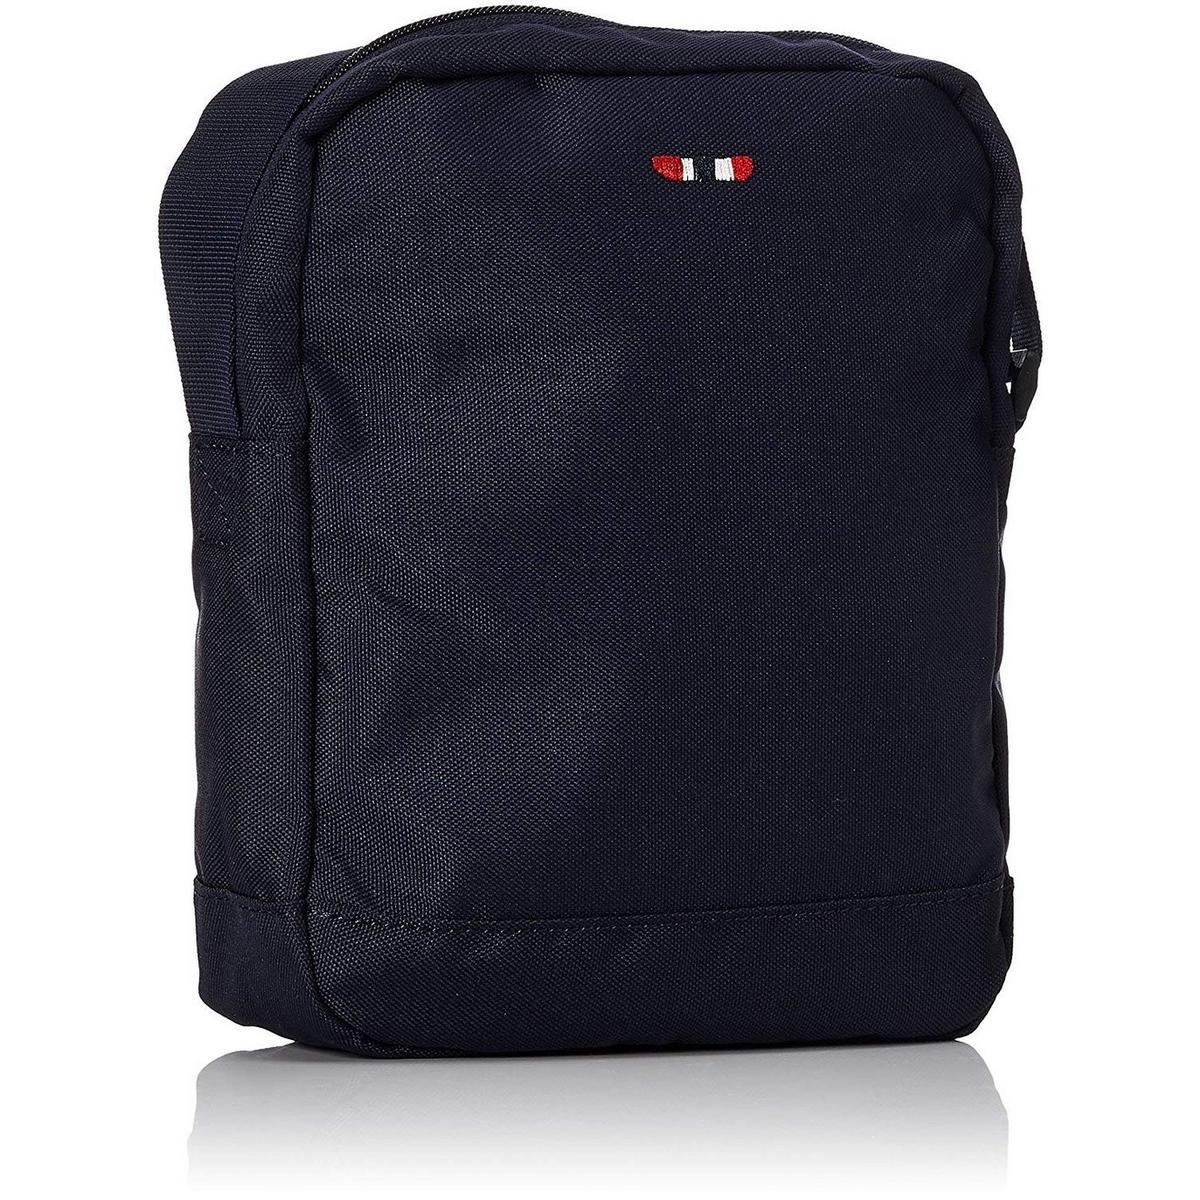 Napapijri Happy Cross Pocket Bag